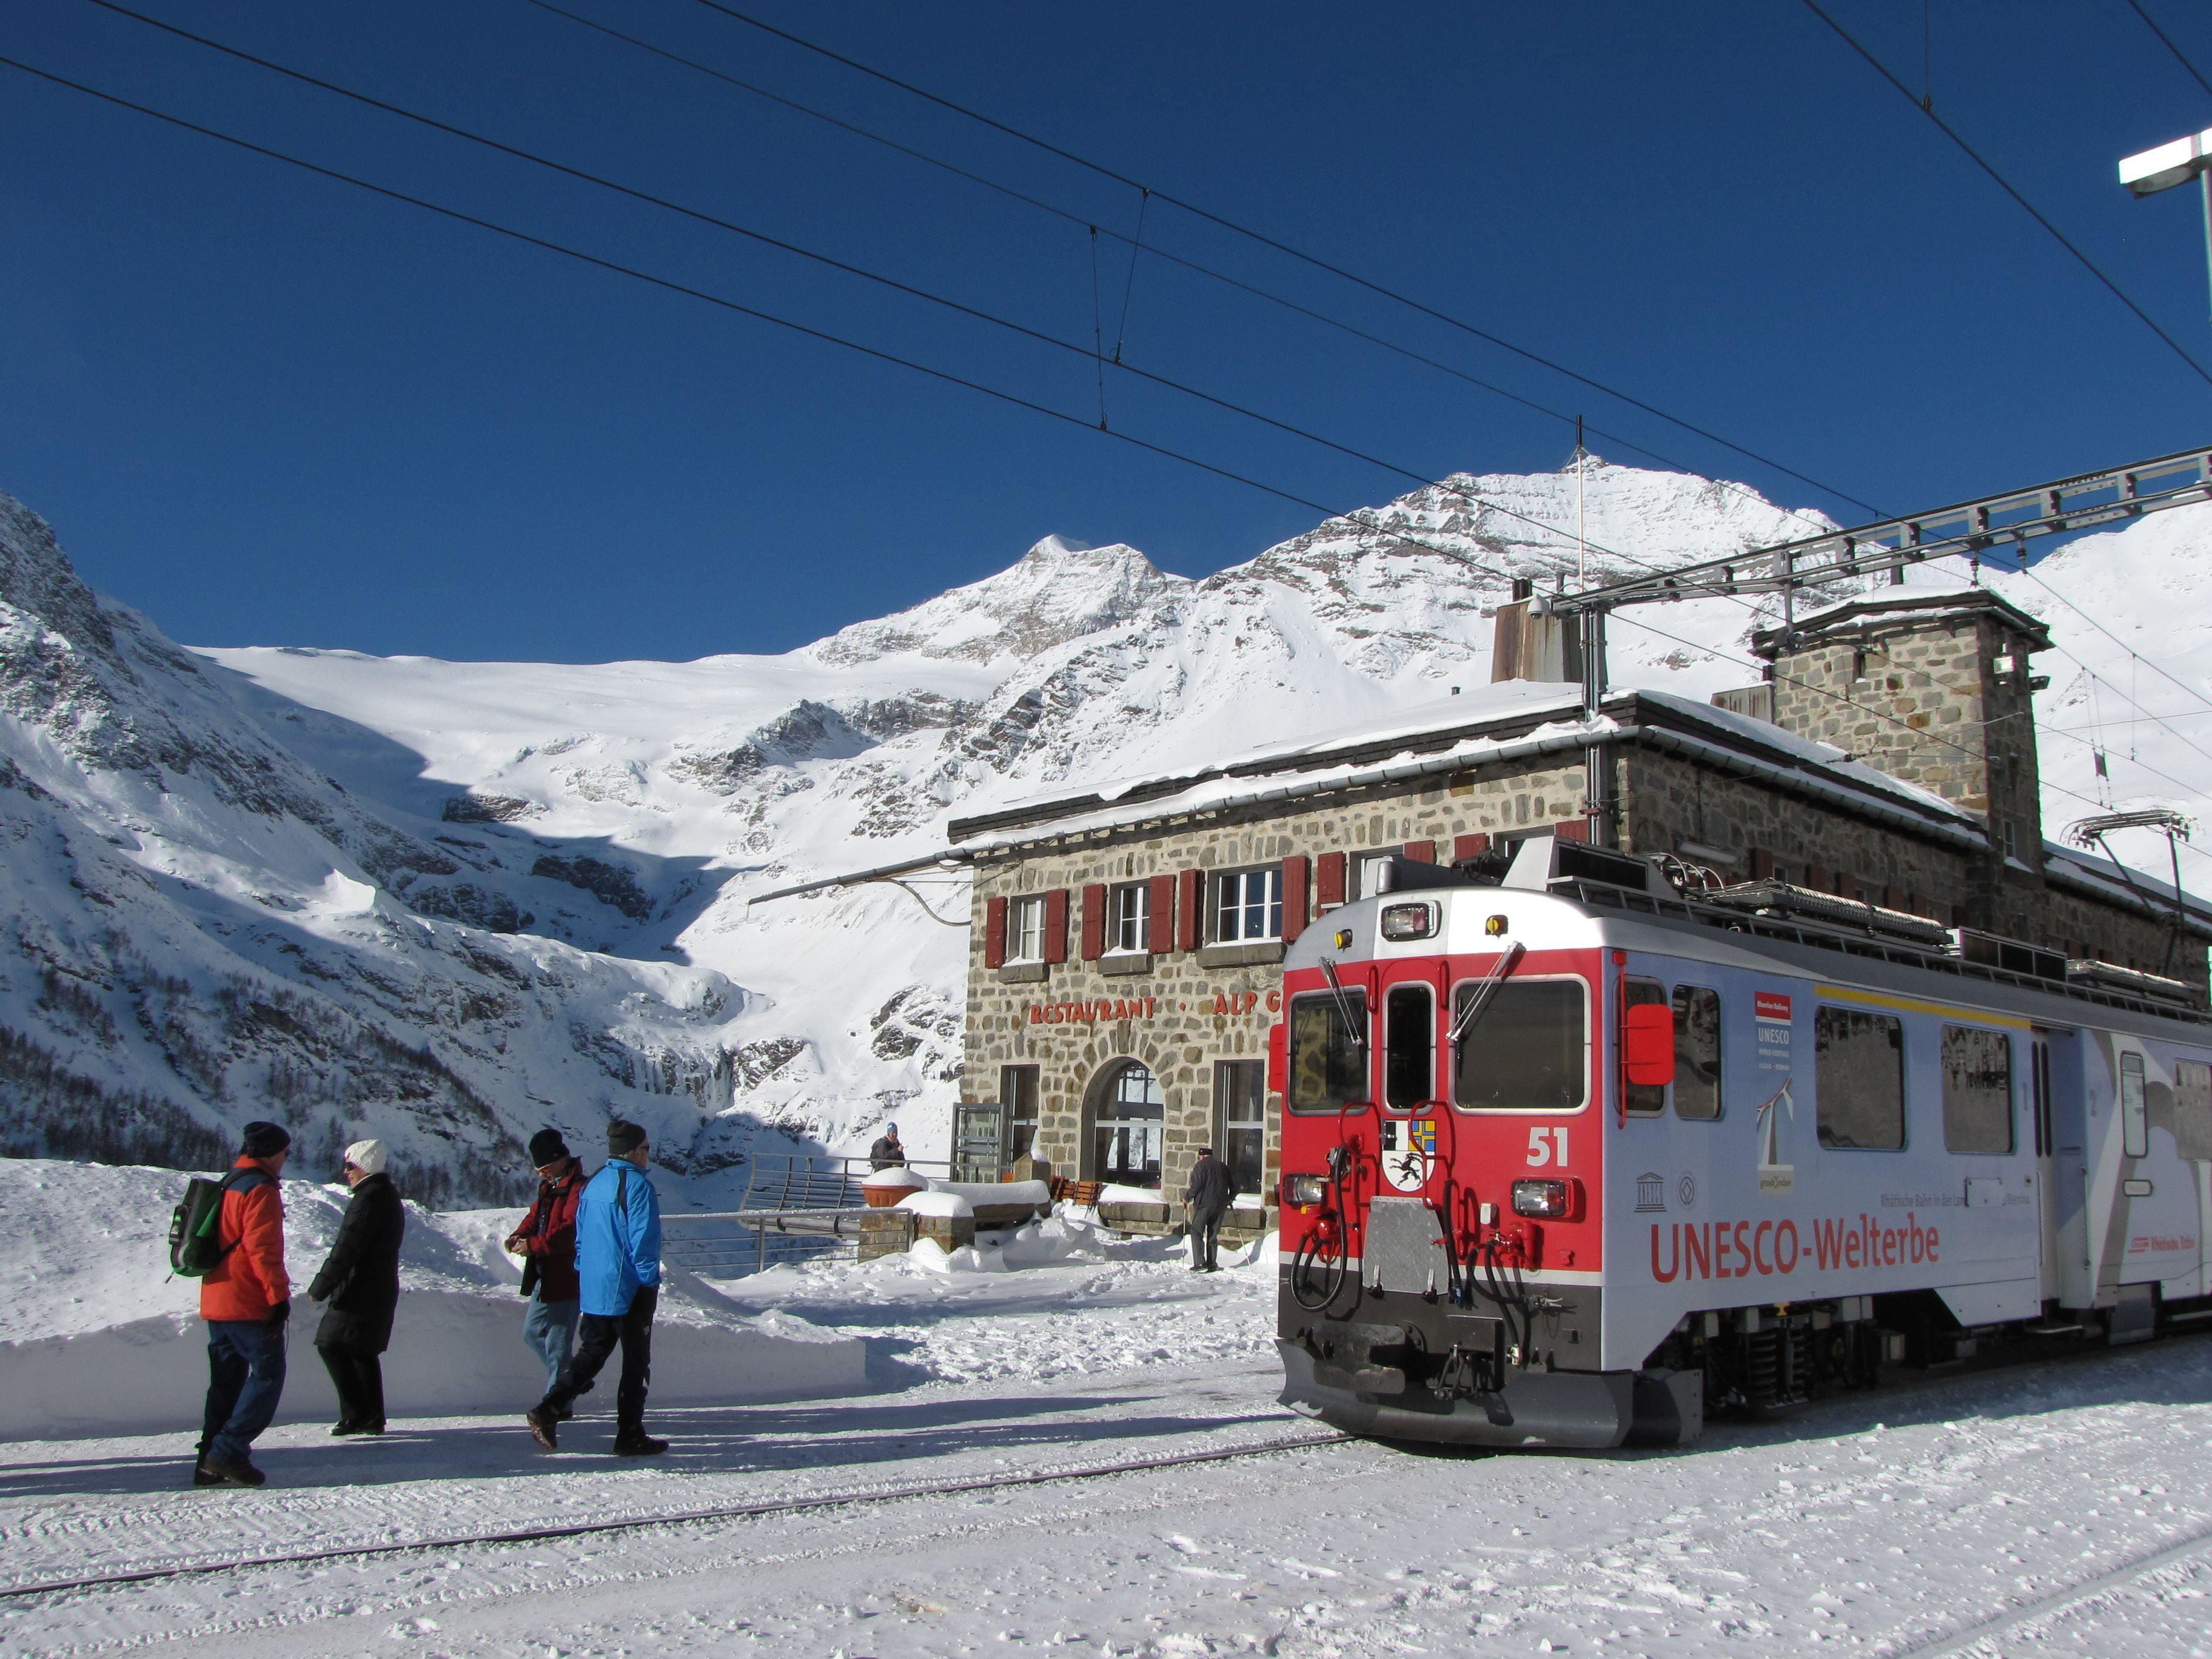 Albergo Ristorante Alp